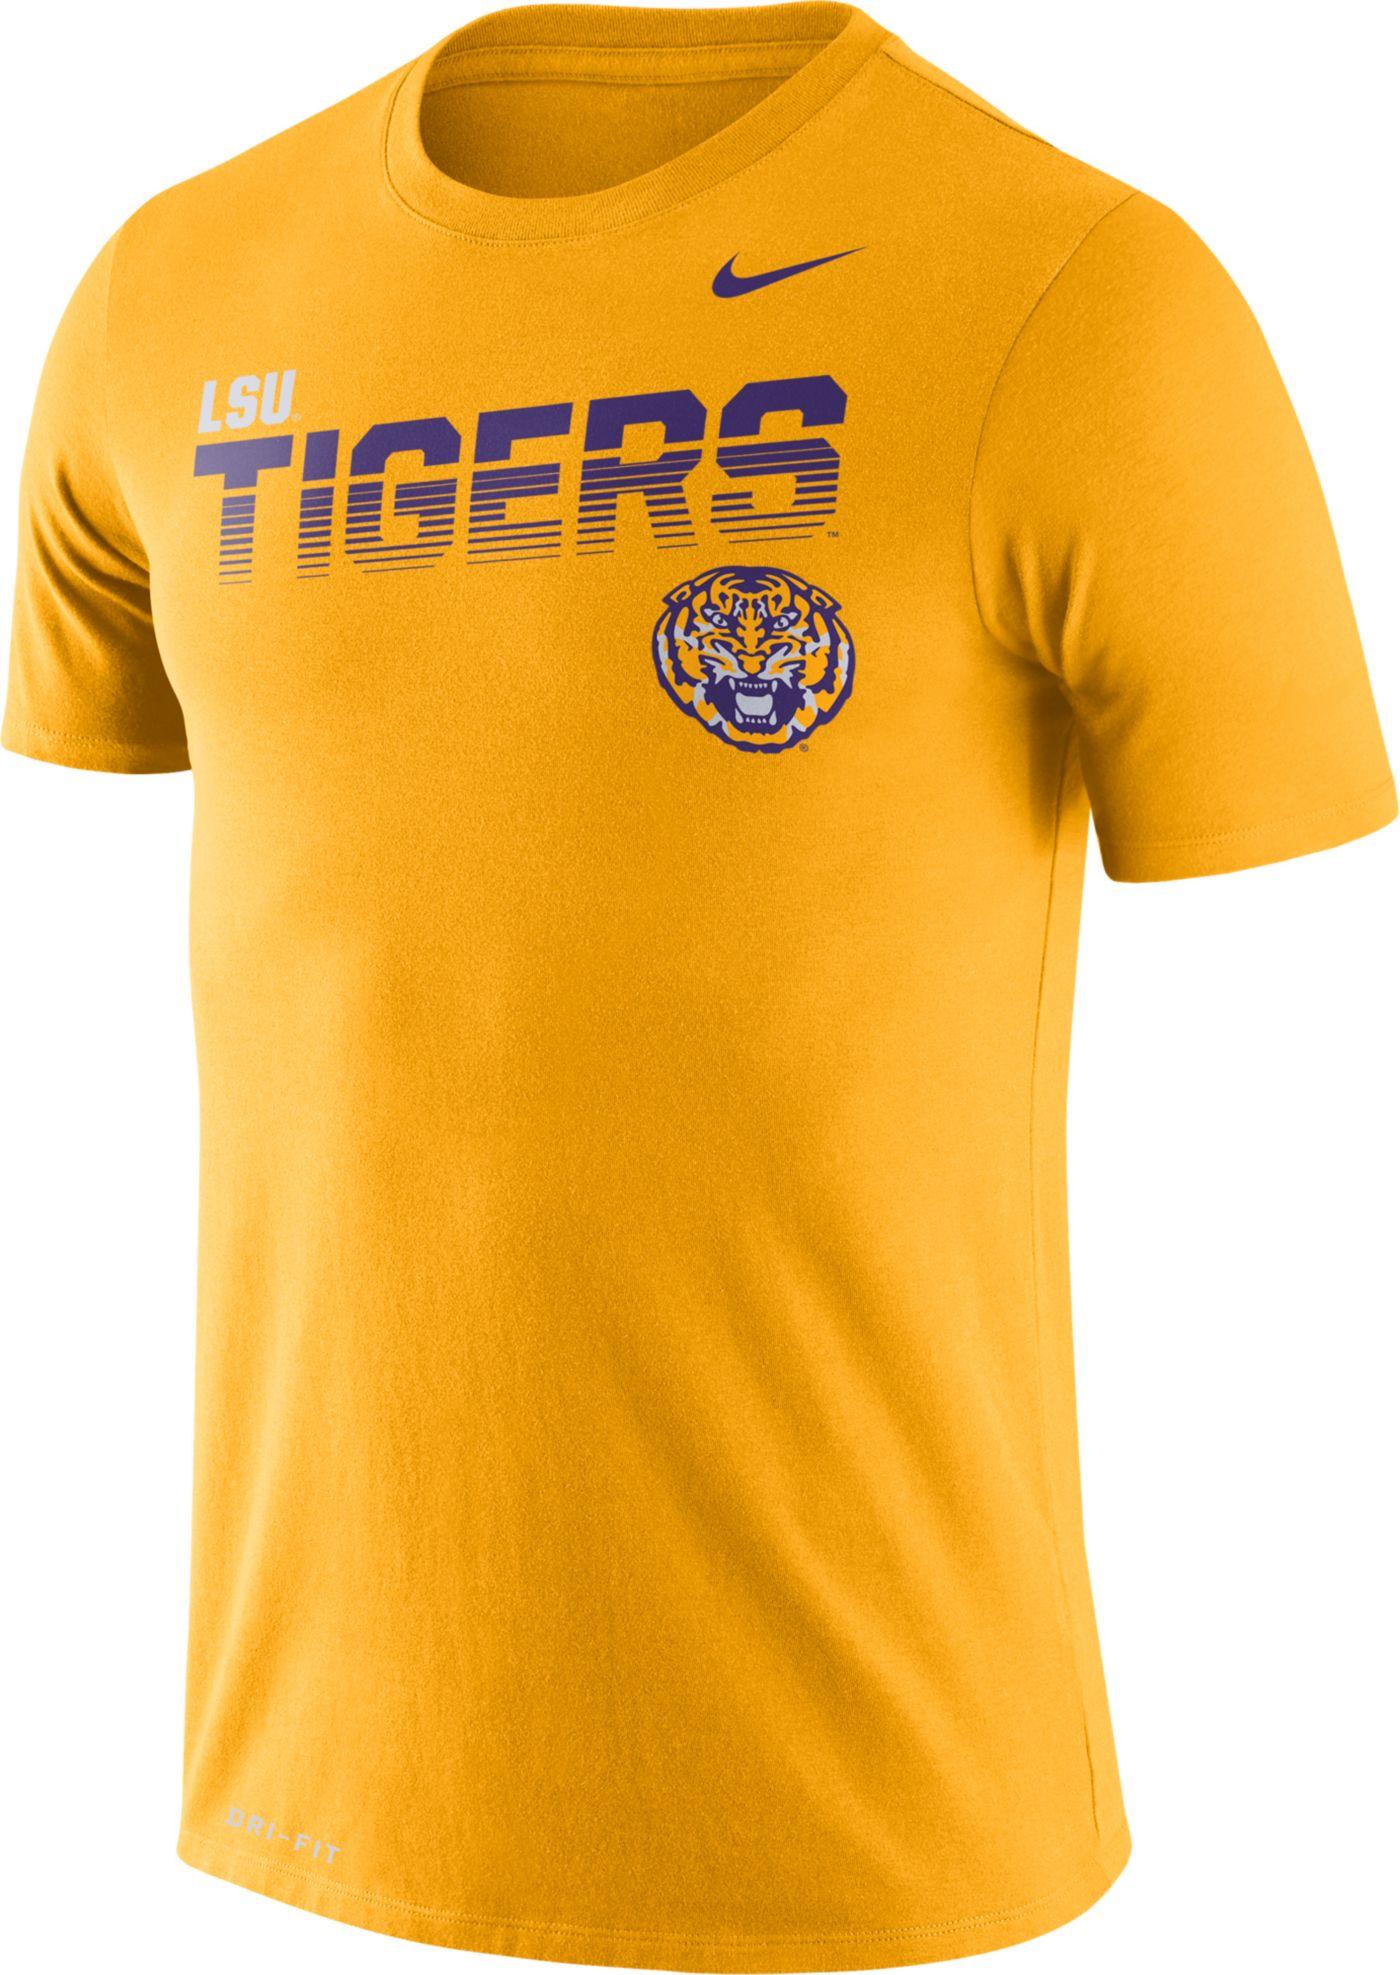 Nike Men's LSU Tigers Gold Legend Football Sideline T-Shirt